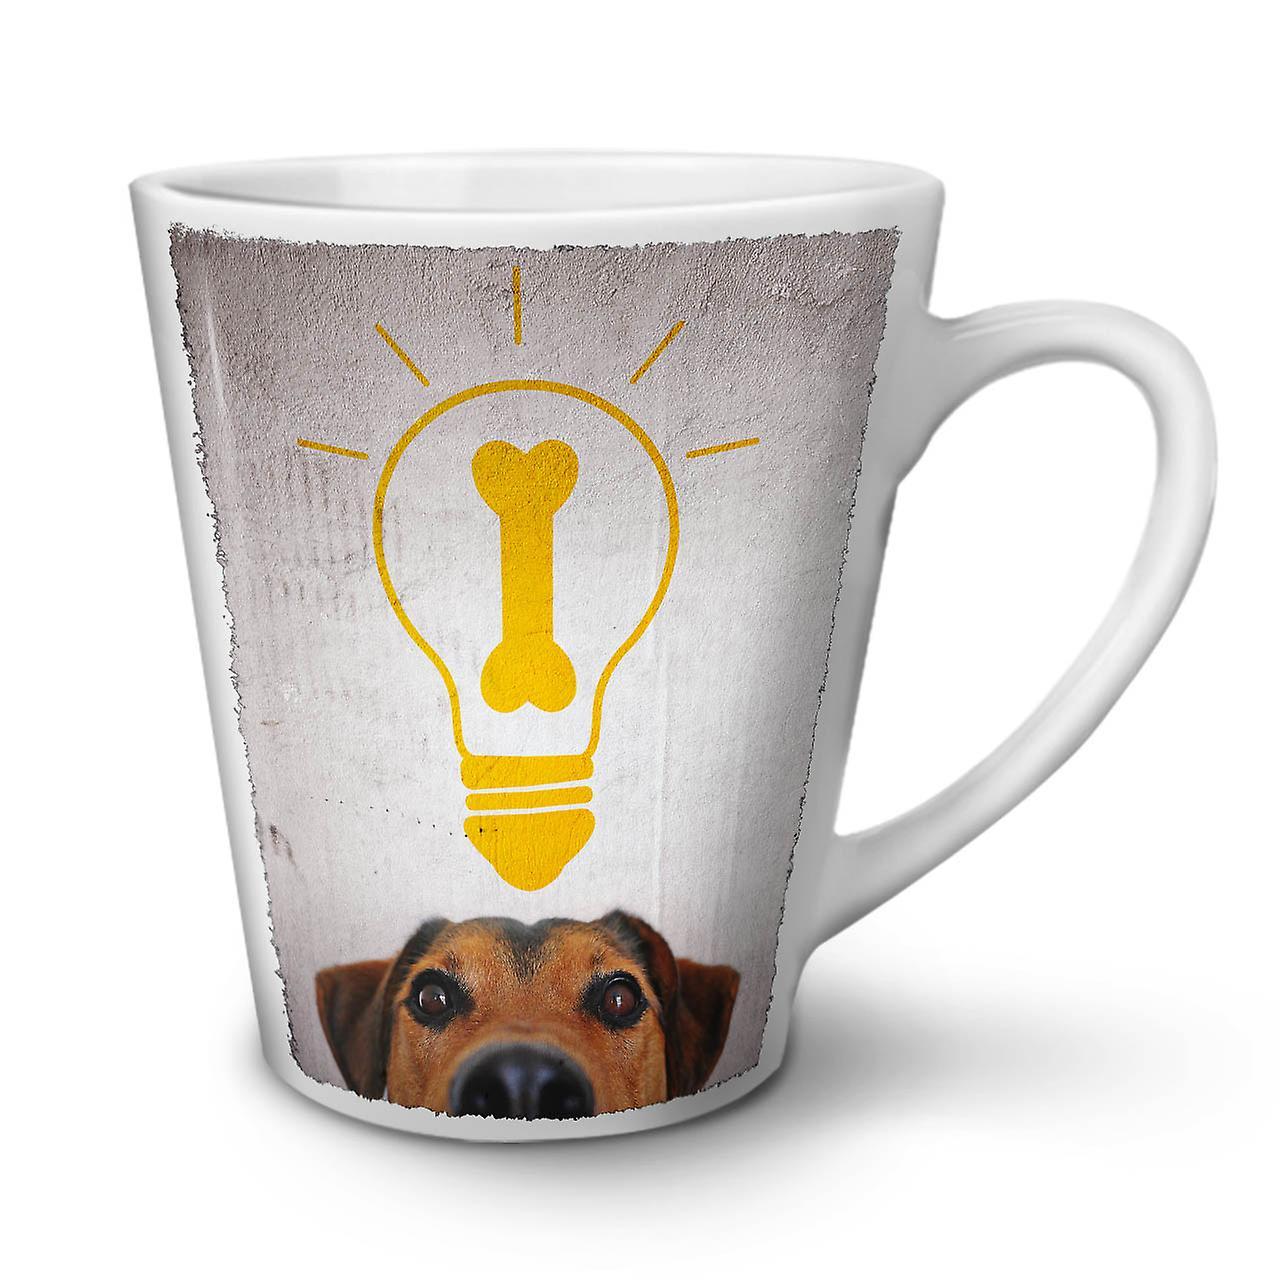 Tea Latte Ceramic New Mug OzWellcoda Terrier Cute Idea White Coffee 12 35A4RjLq